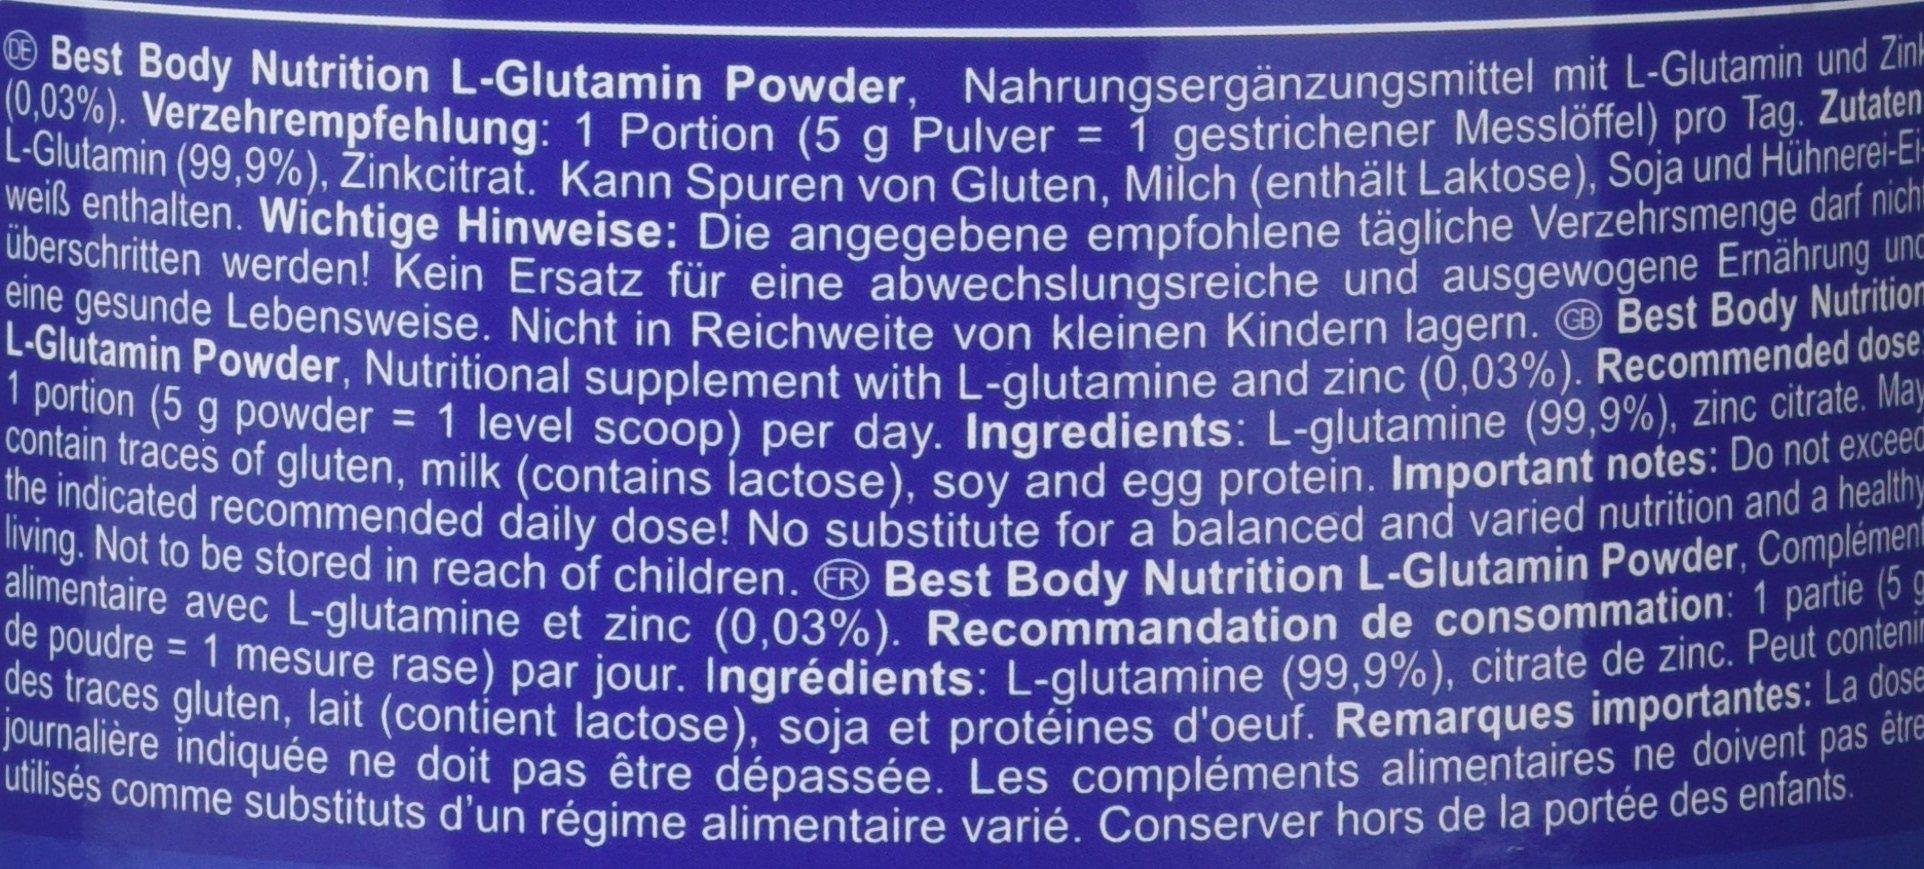 81706PKSOIL - Best Body Nutrition Amino Acids L-Glutamine Powder - 250g, 250g